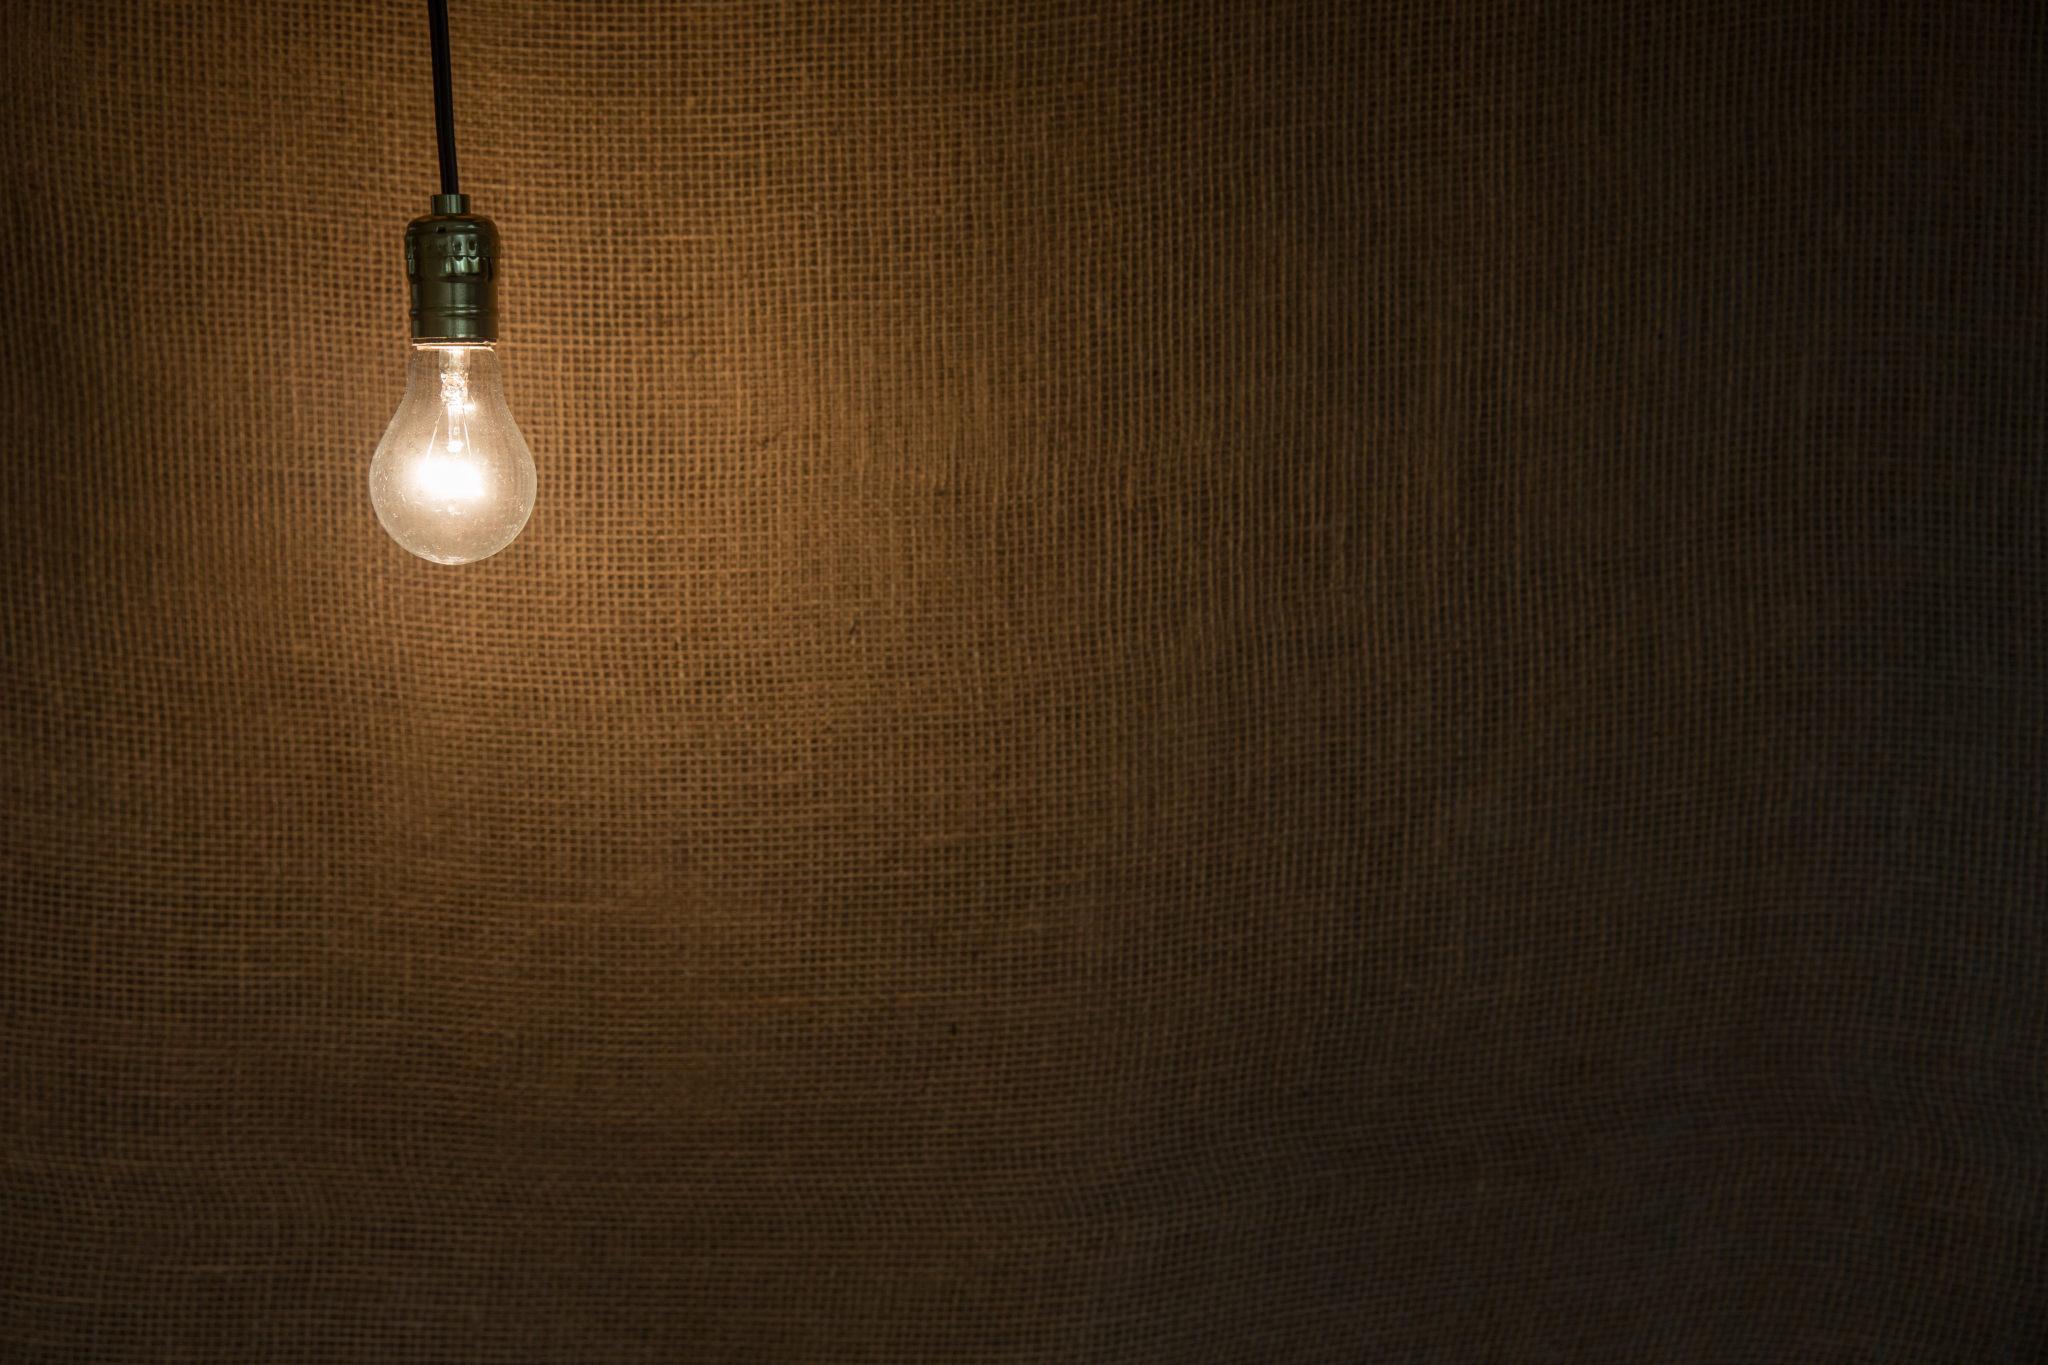 Dark room with light bulb - Light Bulb In Dark Room